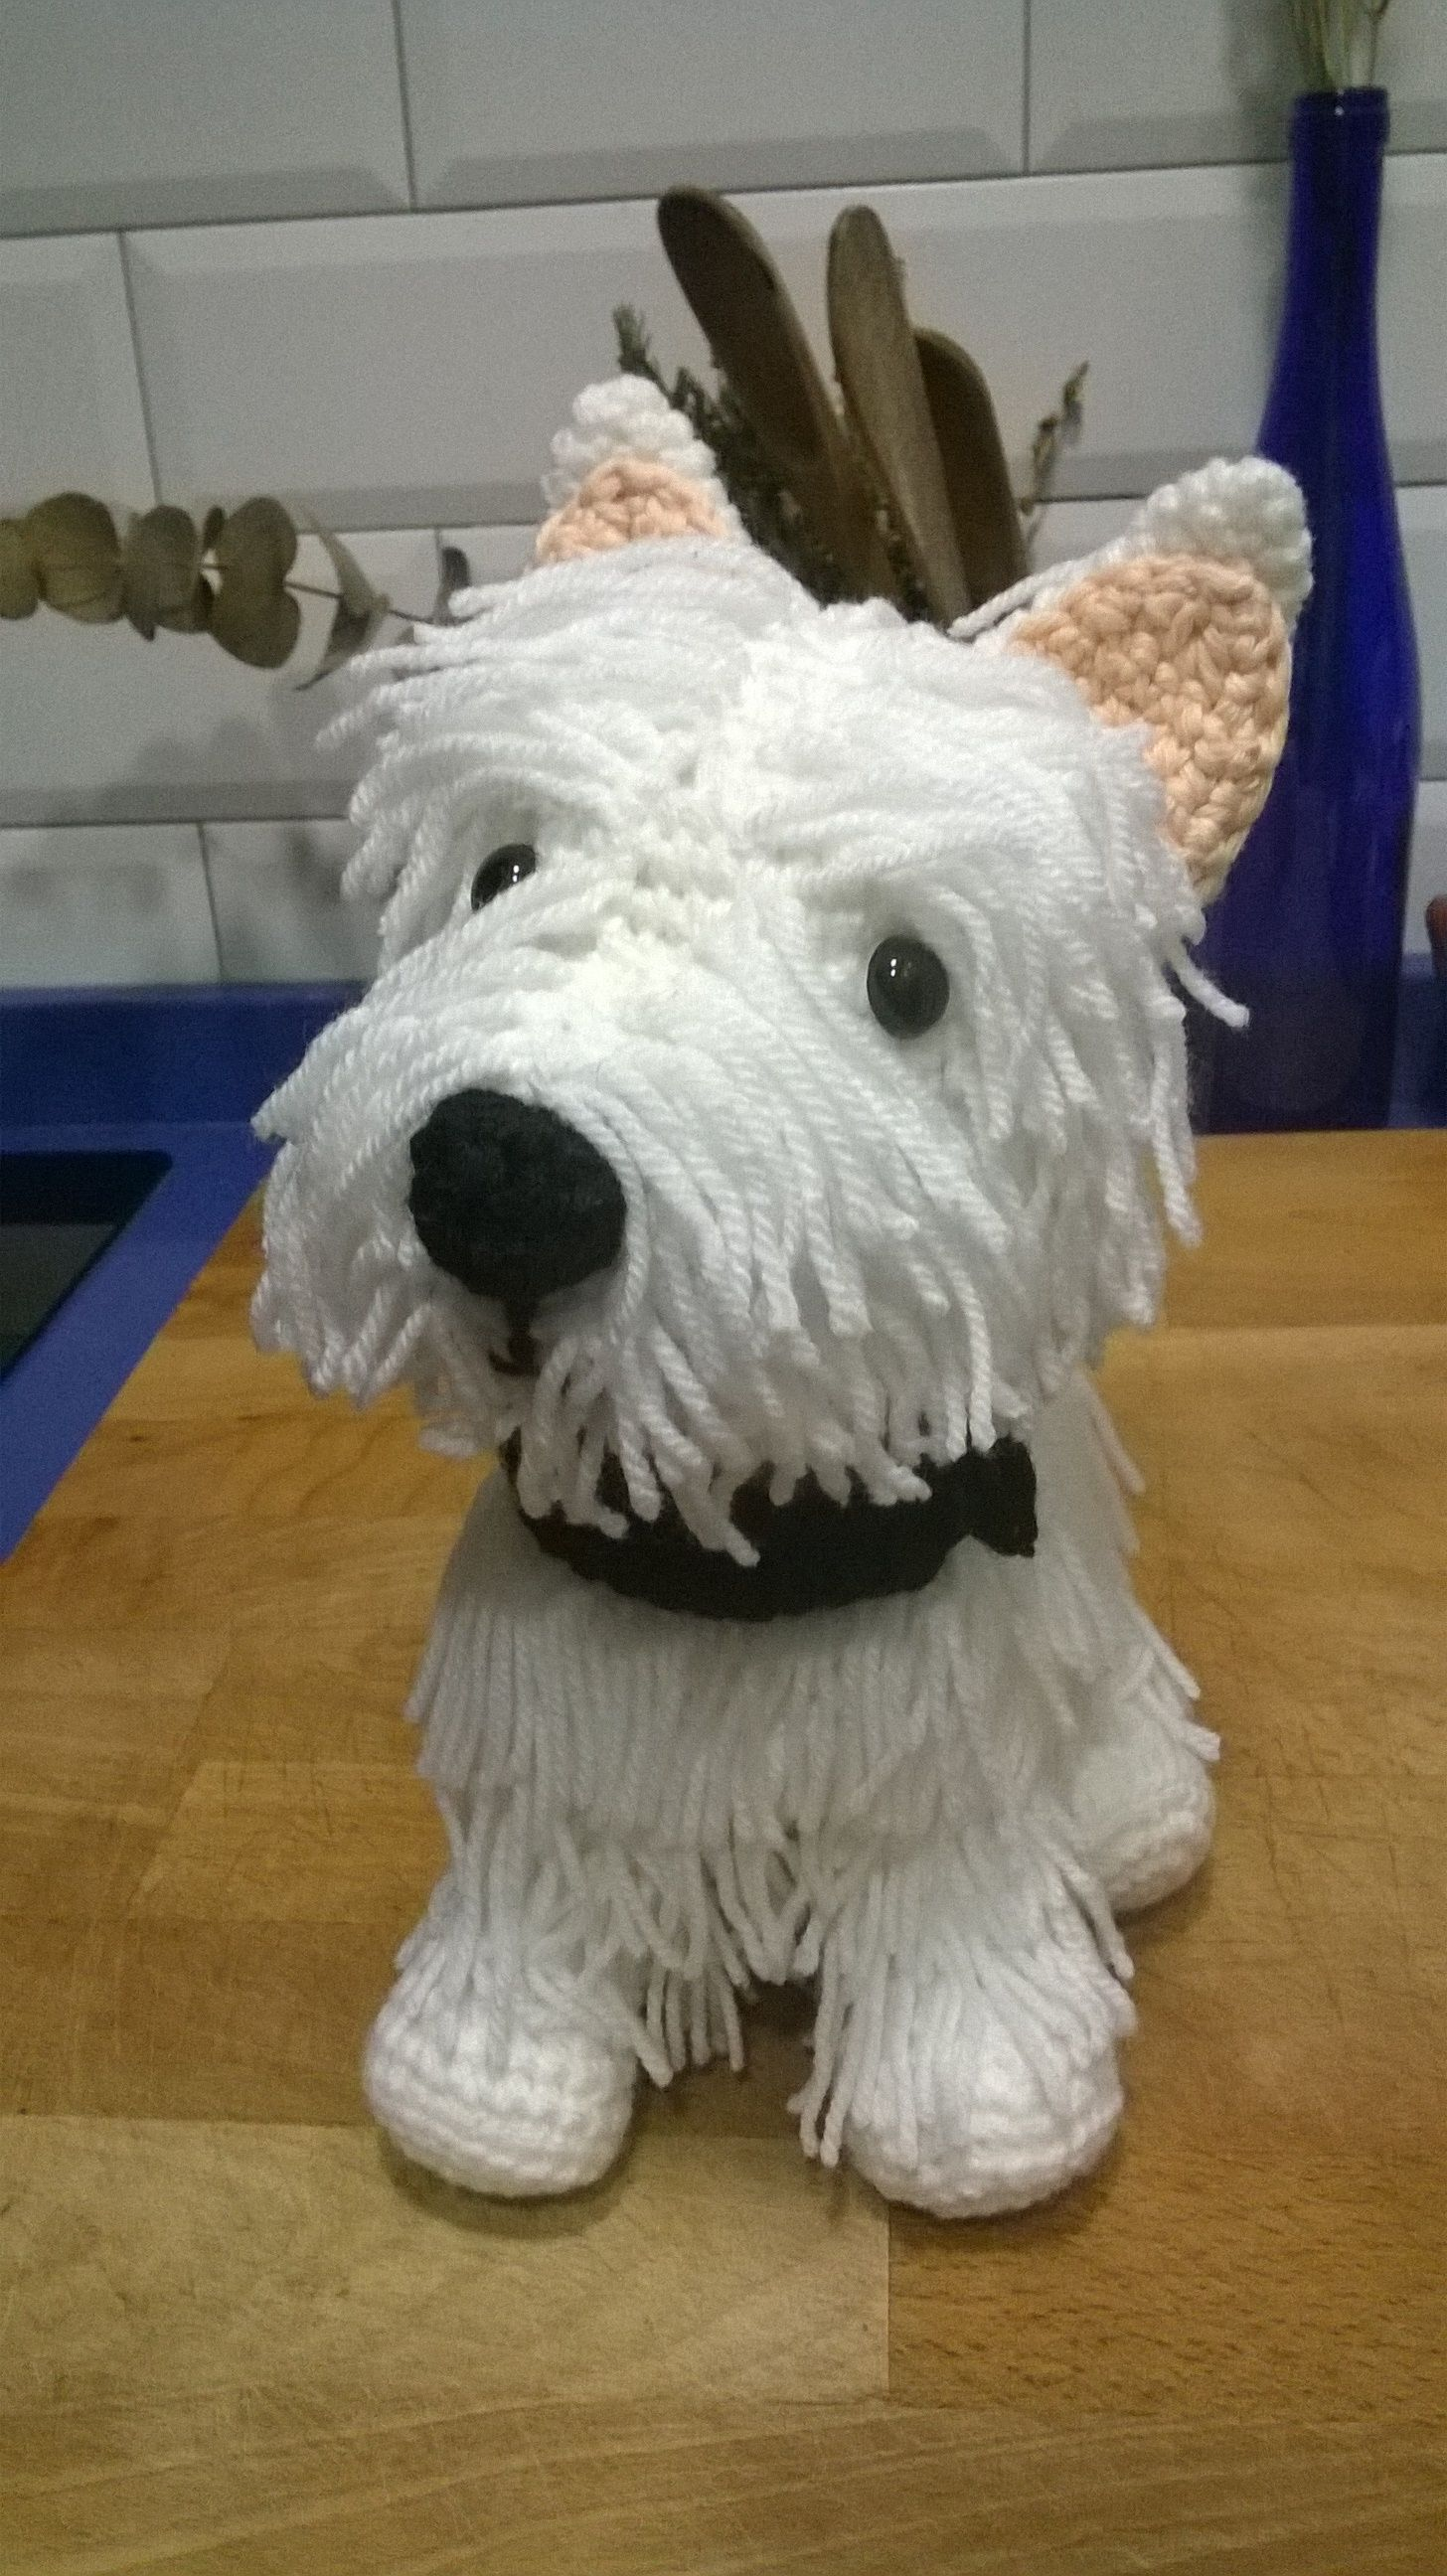 Crochet Schnauzer Dog Softie Amigurumi Free Pattern | Crochet cat ... | 2592x1456